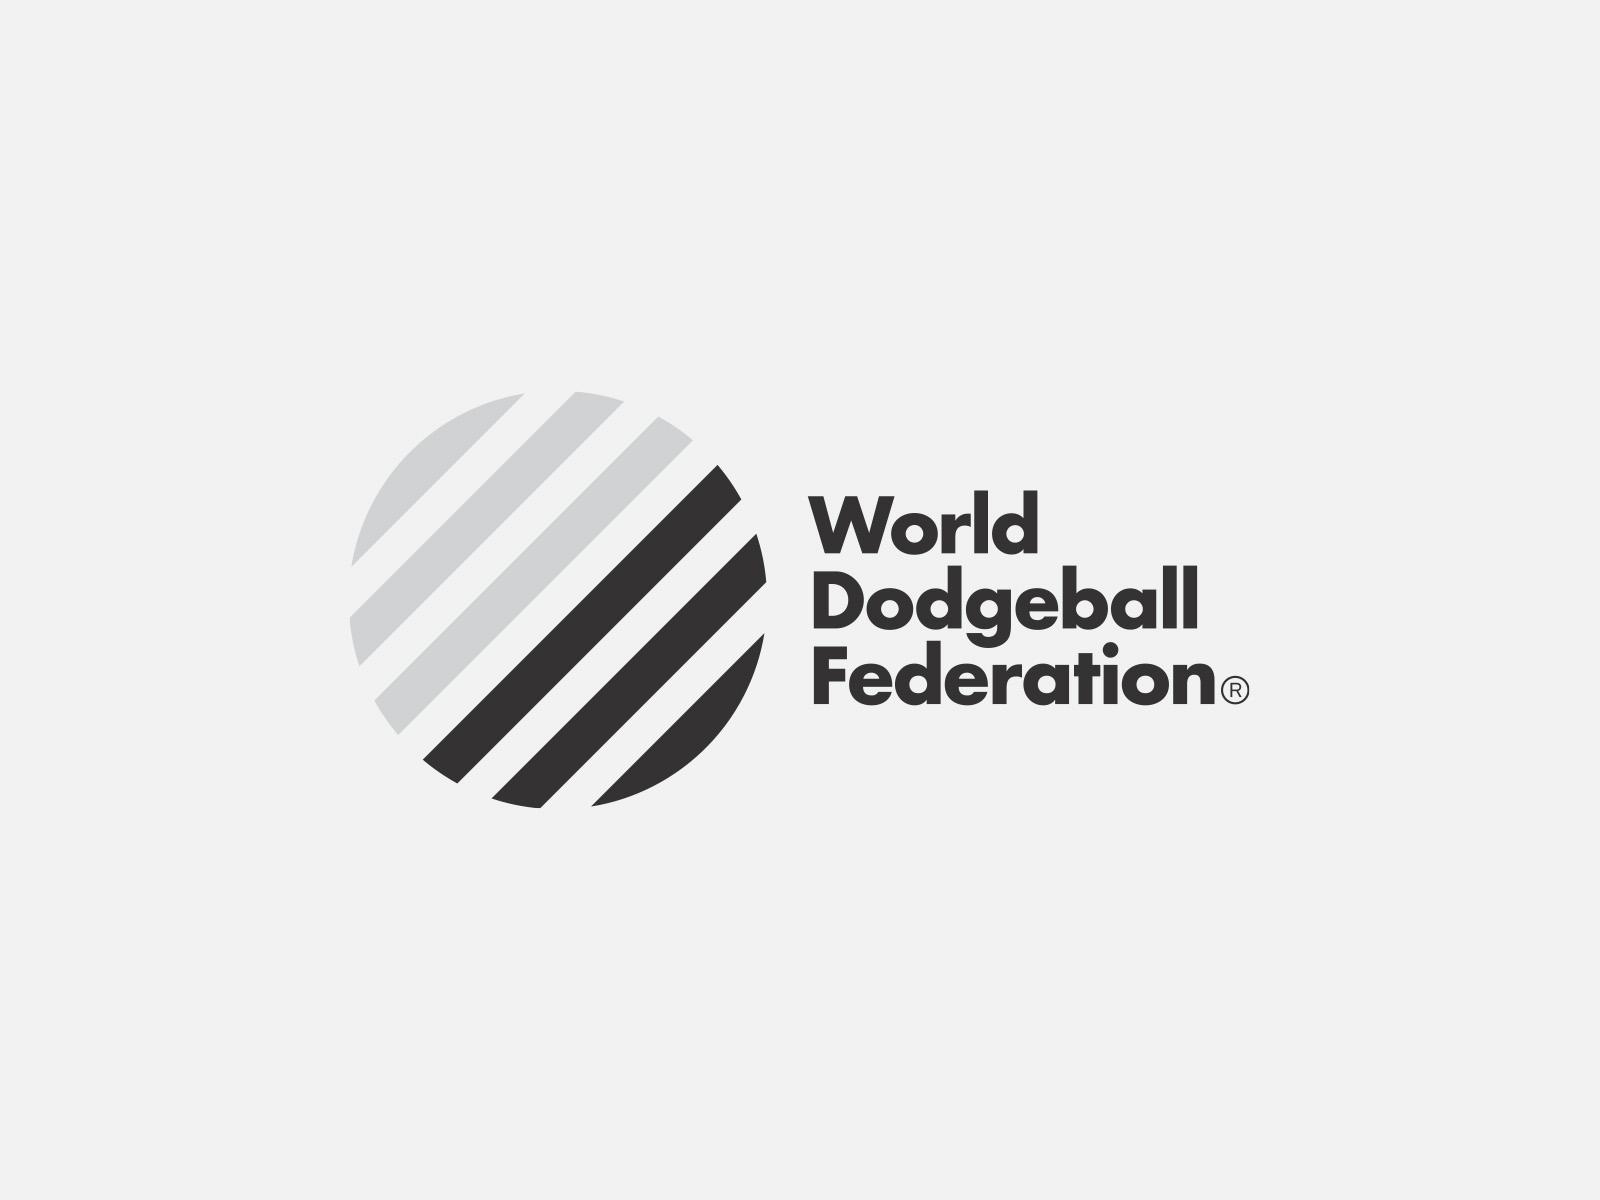 World Dodgeball Federation by Leo Burnett Design